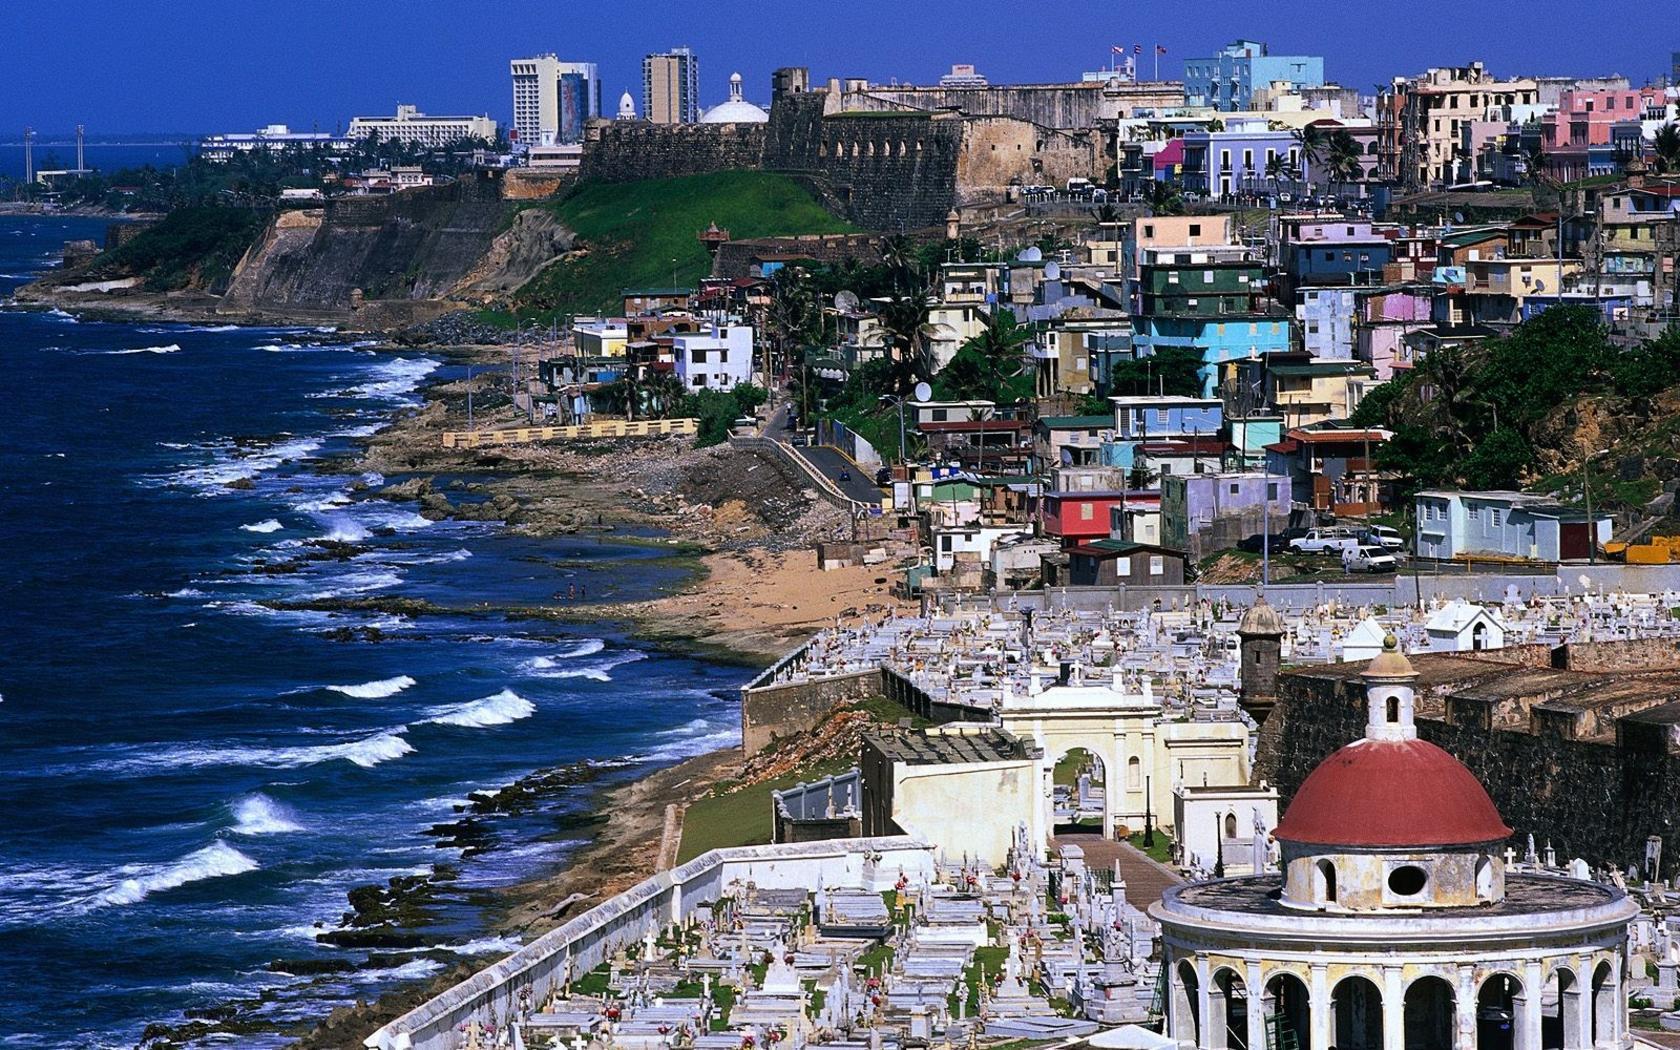 Poster board rental in puerto rico